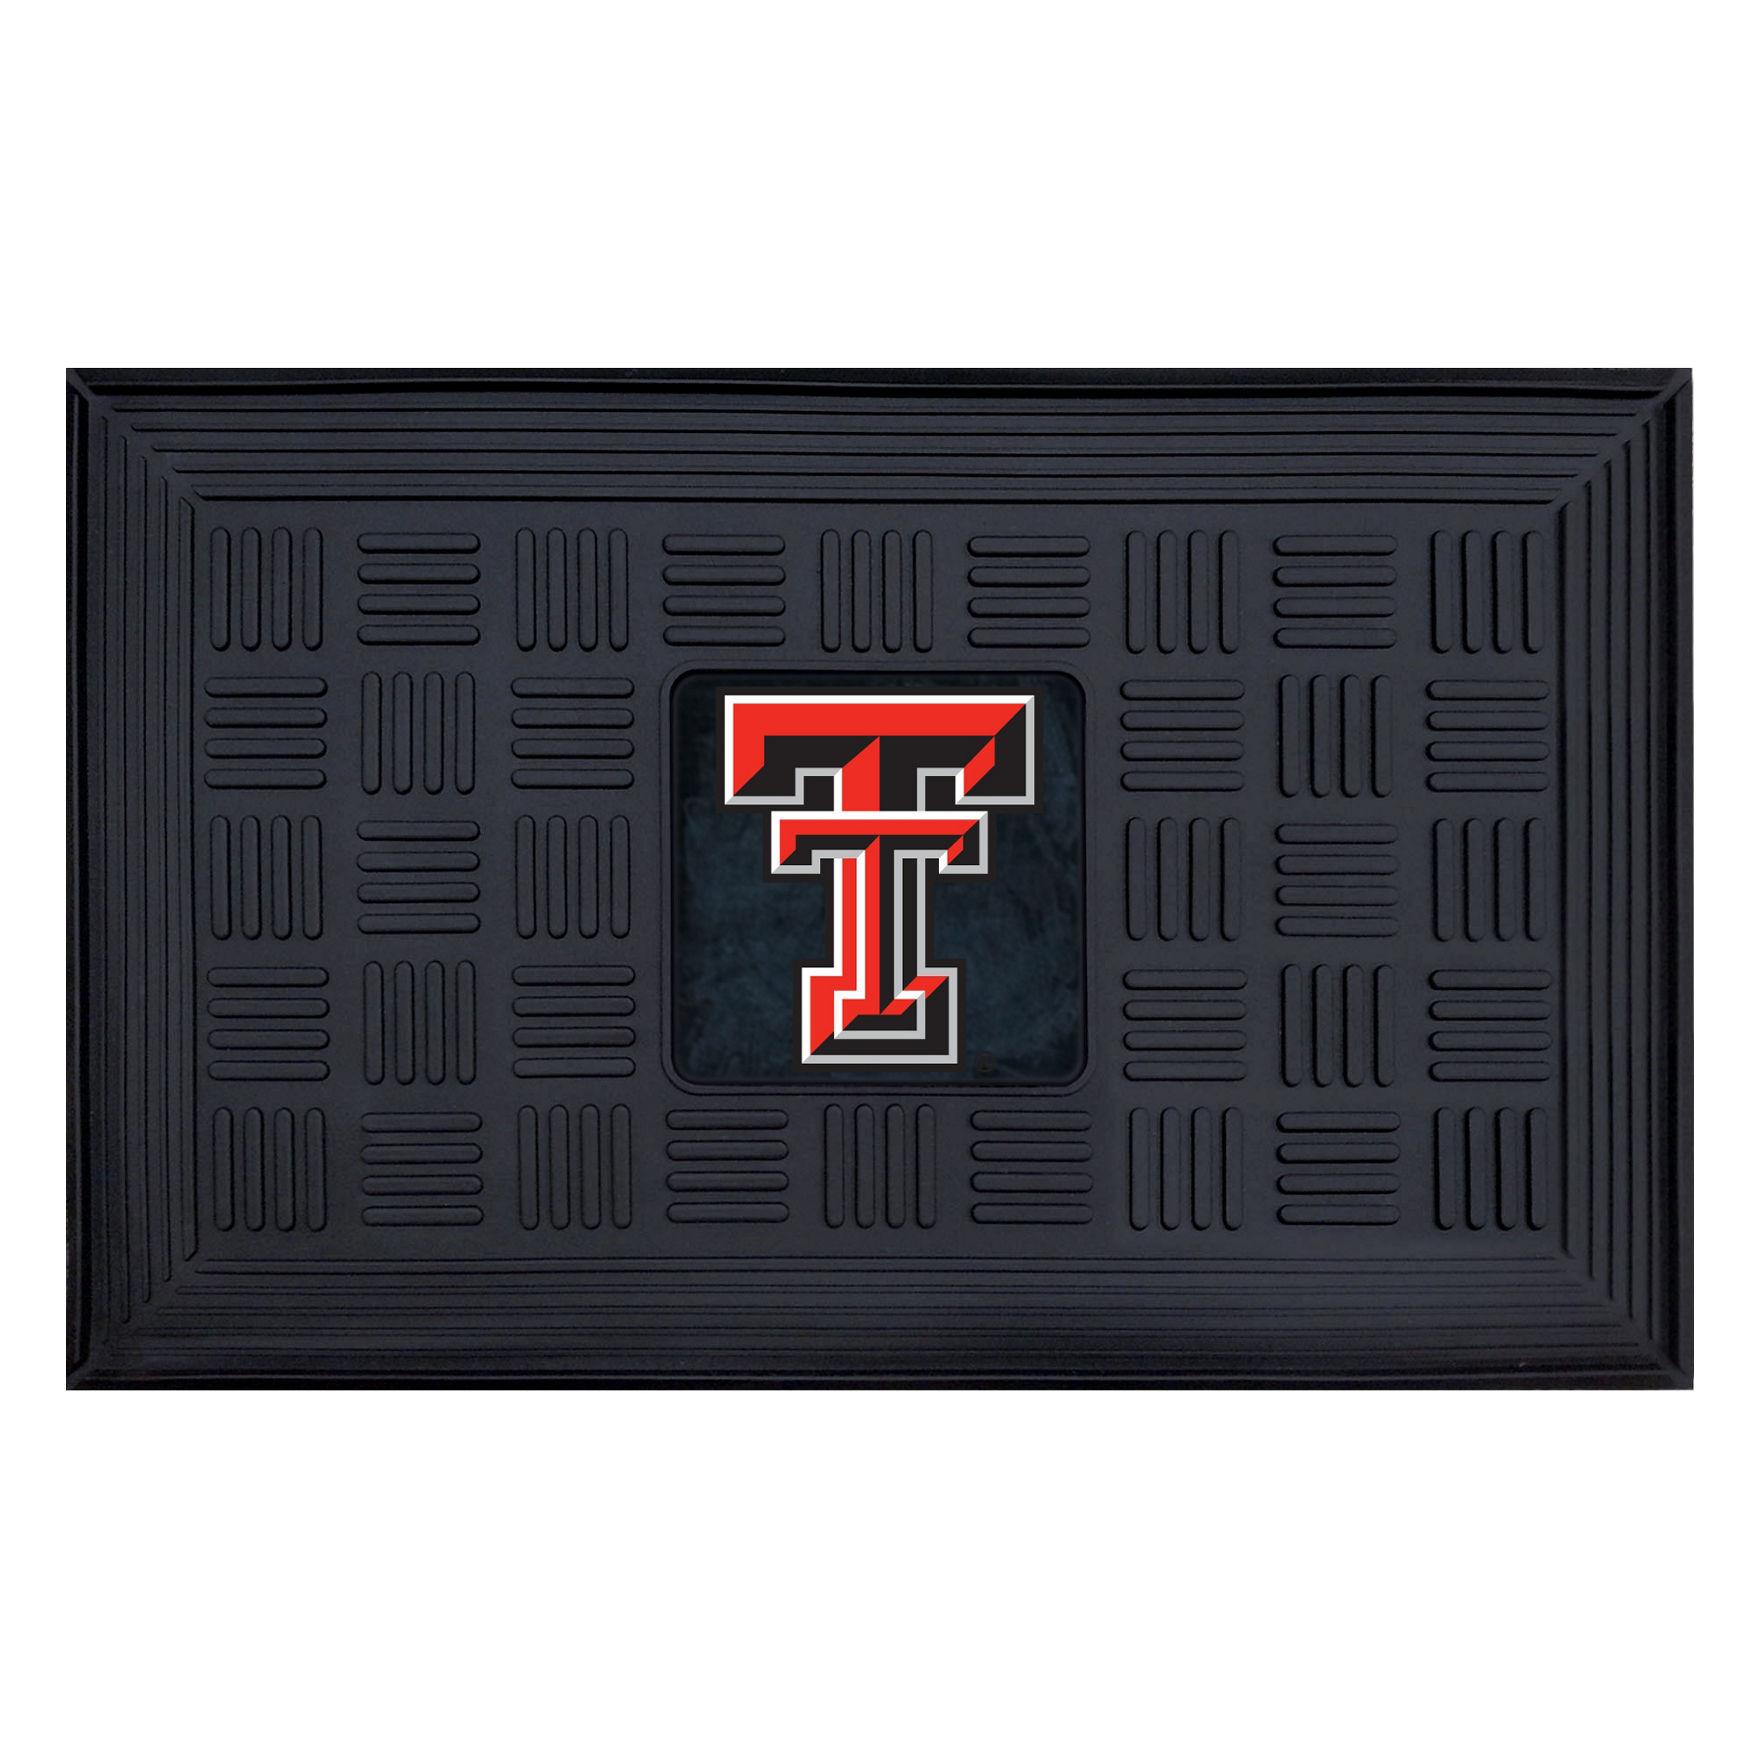 Fanmats Black Accent Rugs Outdoor Rugs & Doormats NCAA Outdoor Decor Rugs